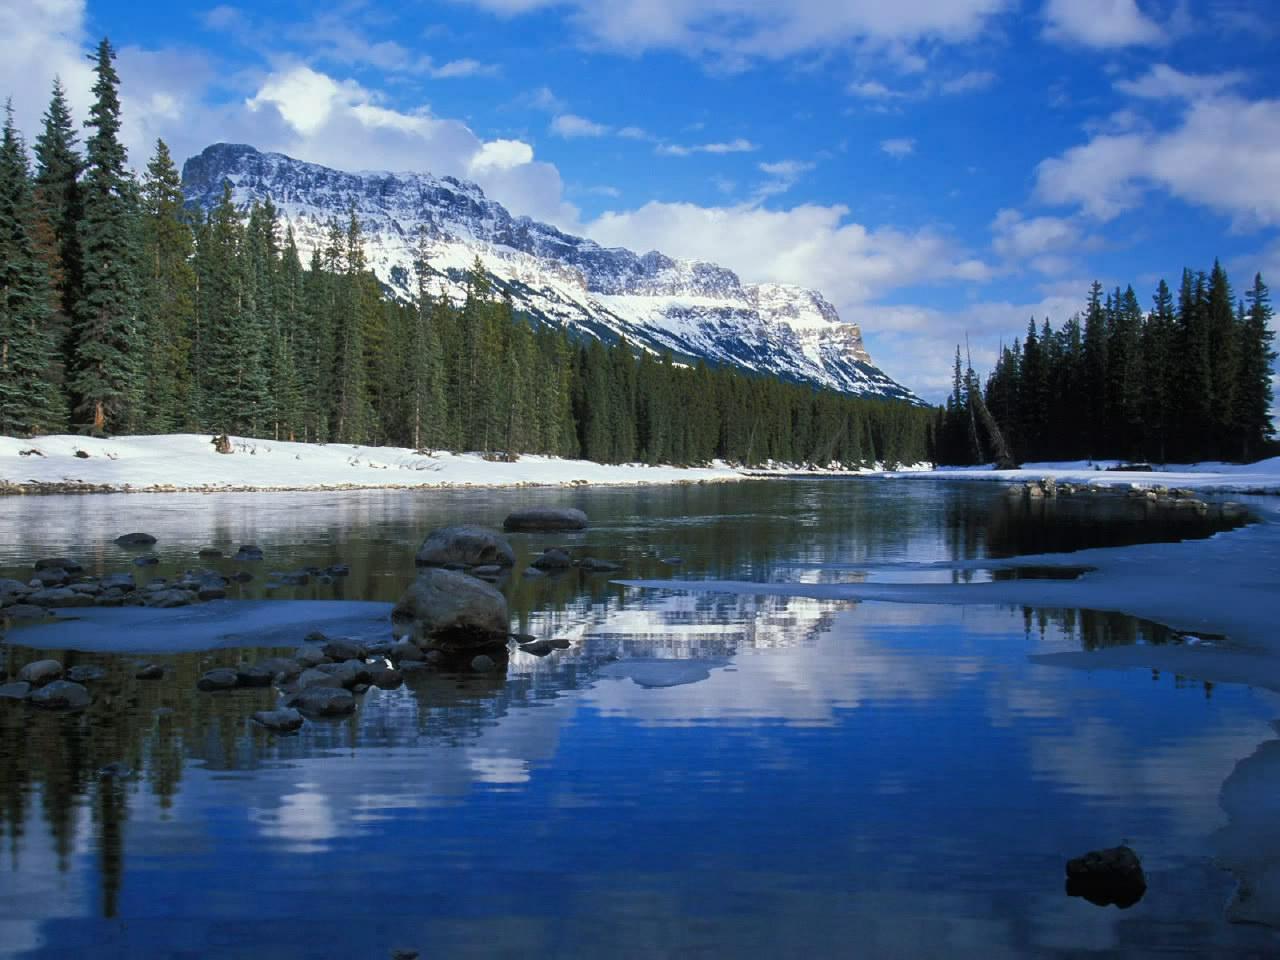 http://1.bp.blogspot.com/-j9mbxDsonQg/Tc9faVvfBFI/AAAAAAAABnc/mmFjP4enCuw/s1600/Nature-Landscape-HD-Dream.jpg